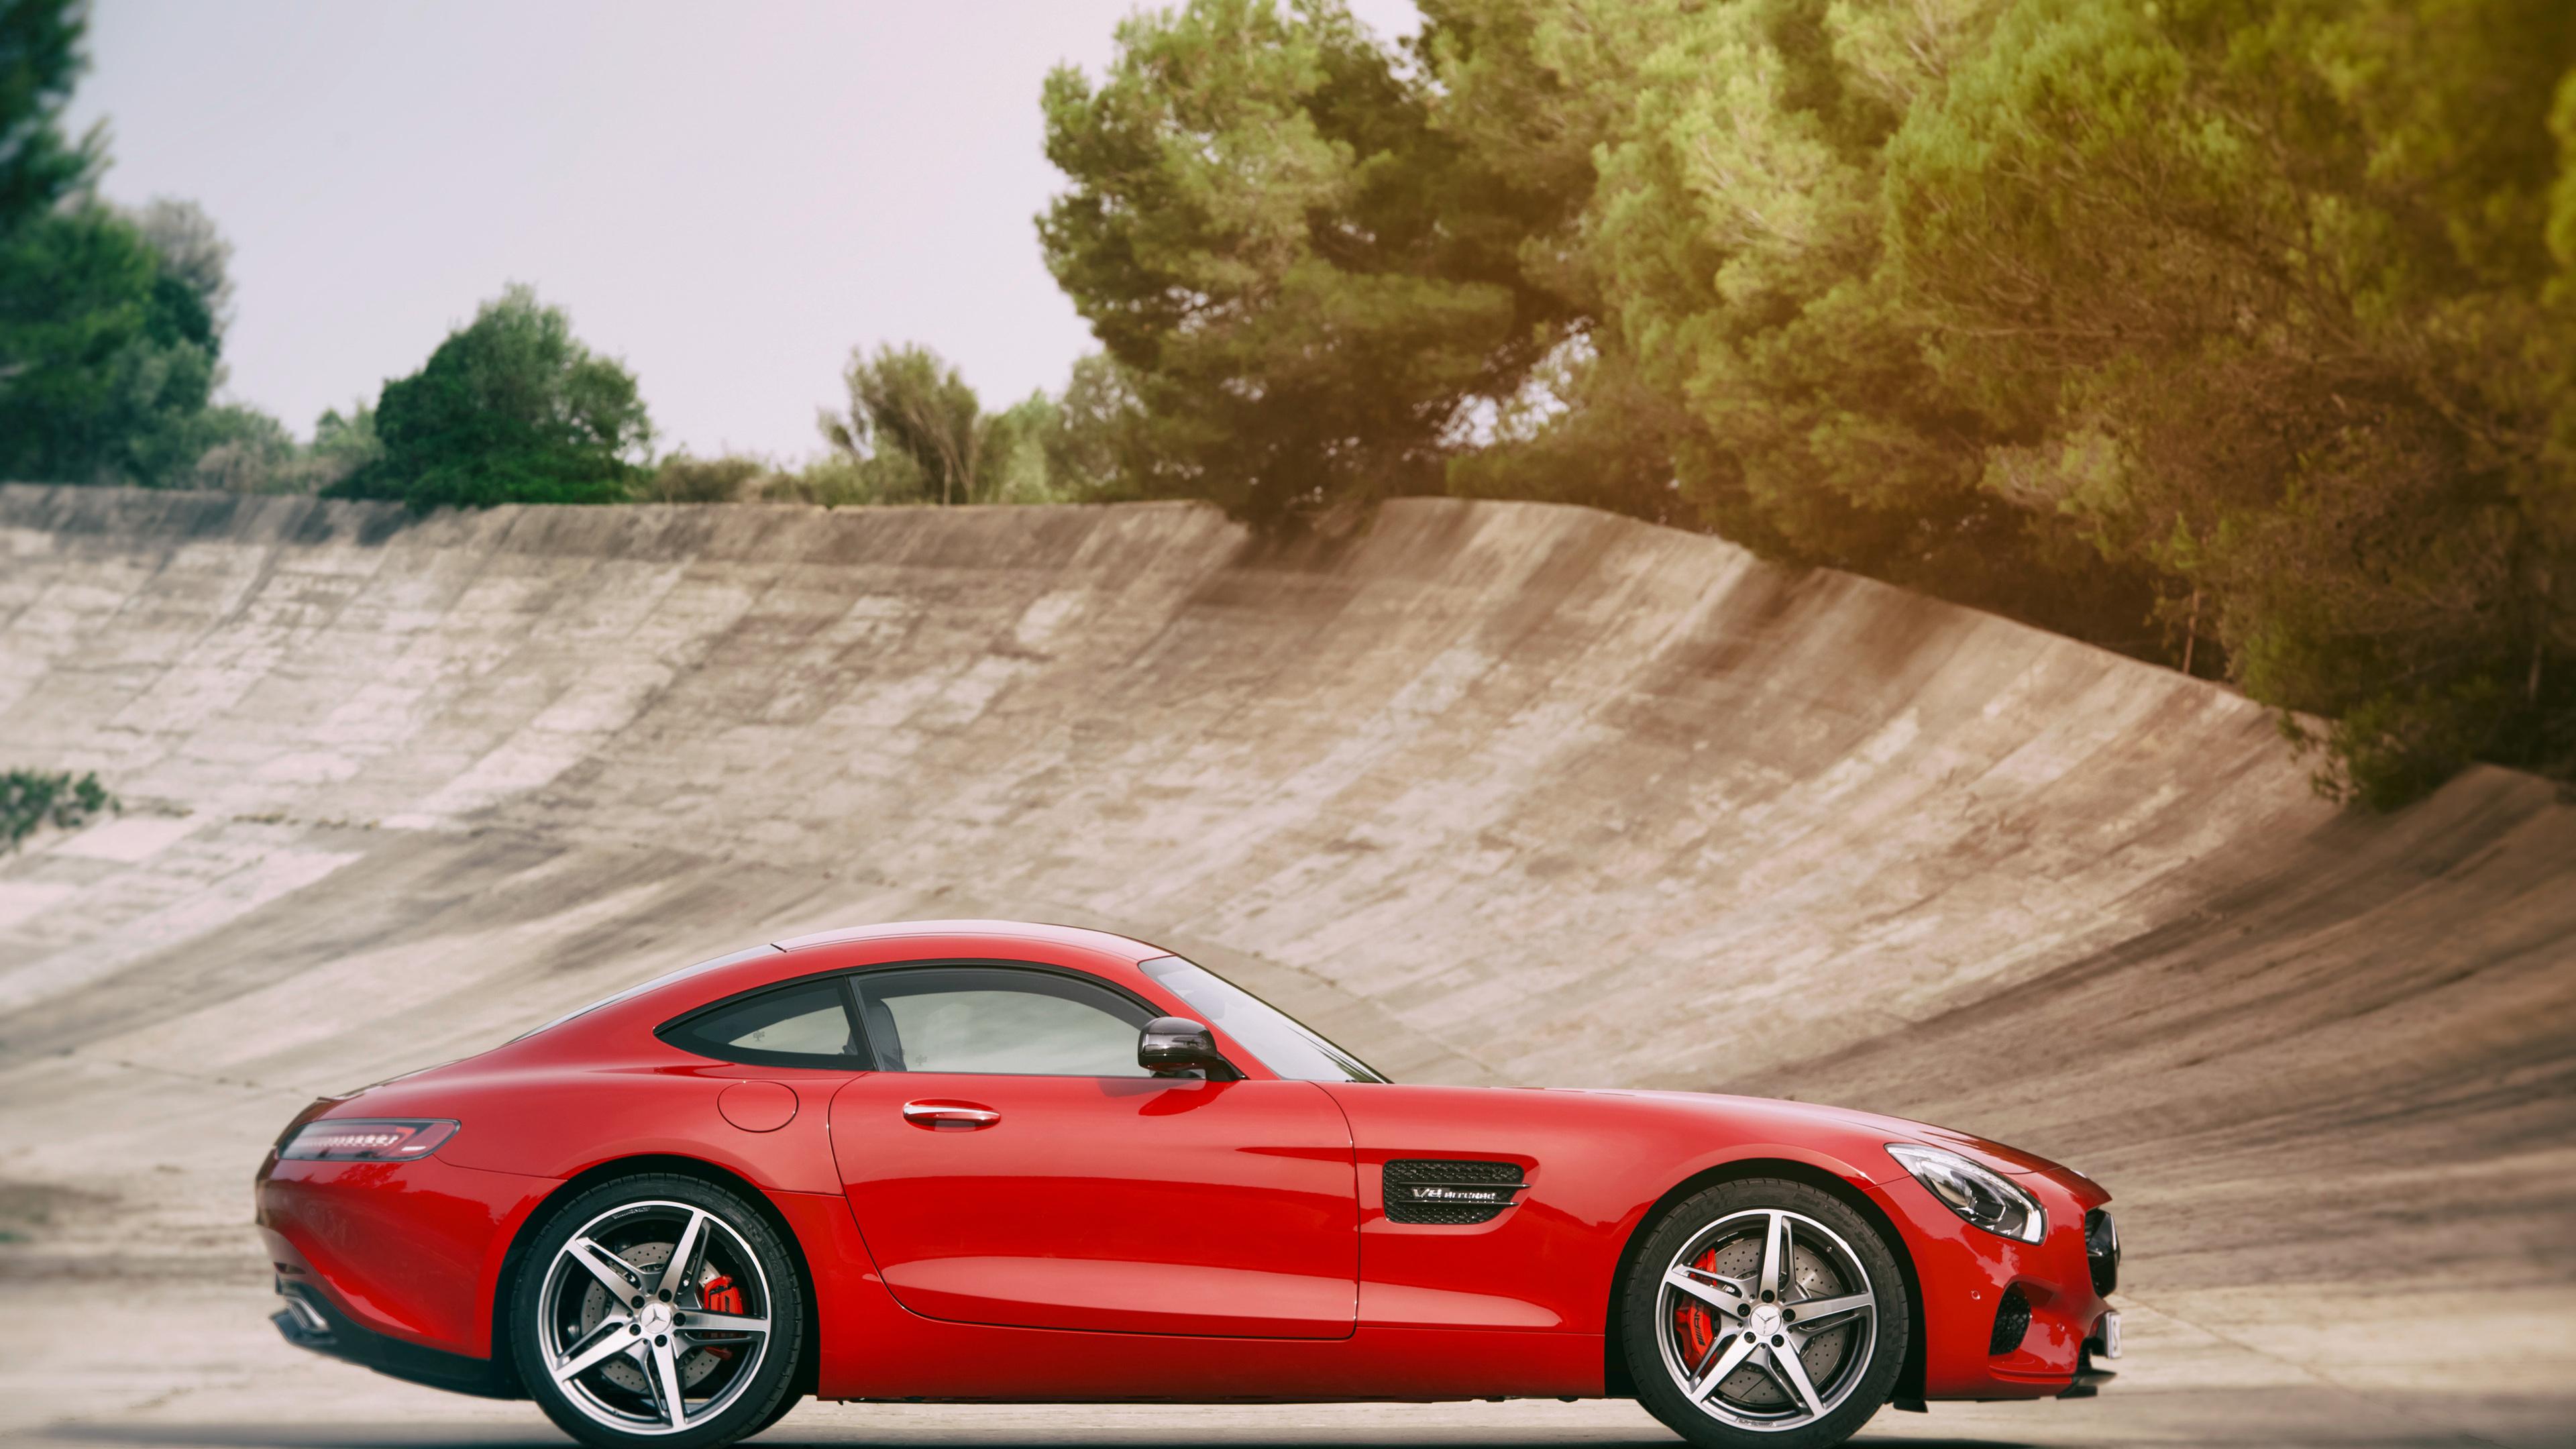 mercedes amg gt s 2017 1539109009 - Mercedes AMG GT S 2017 - mercedes wallpapers, mercedes amg wallpapers, hd-wallpapers, cars wallpapers, 4k-wallpapers, 2017 cars wallpapers